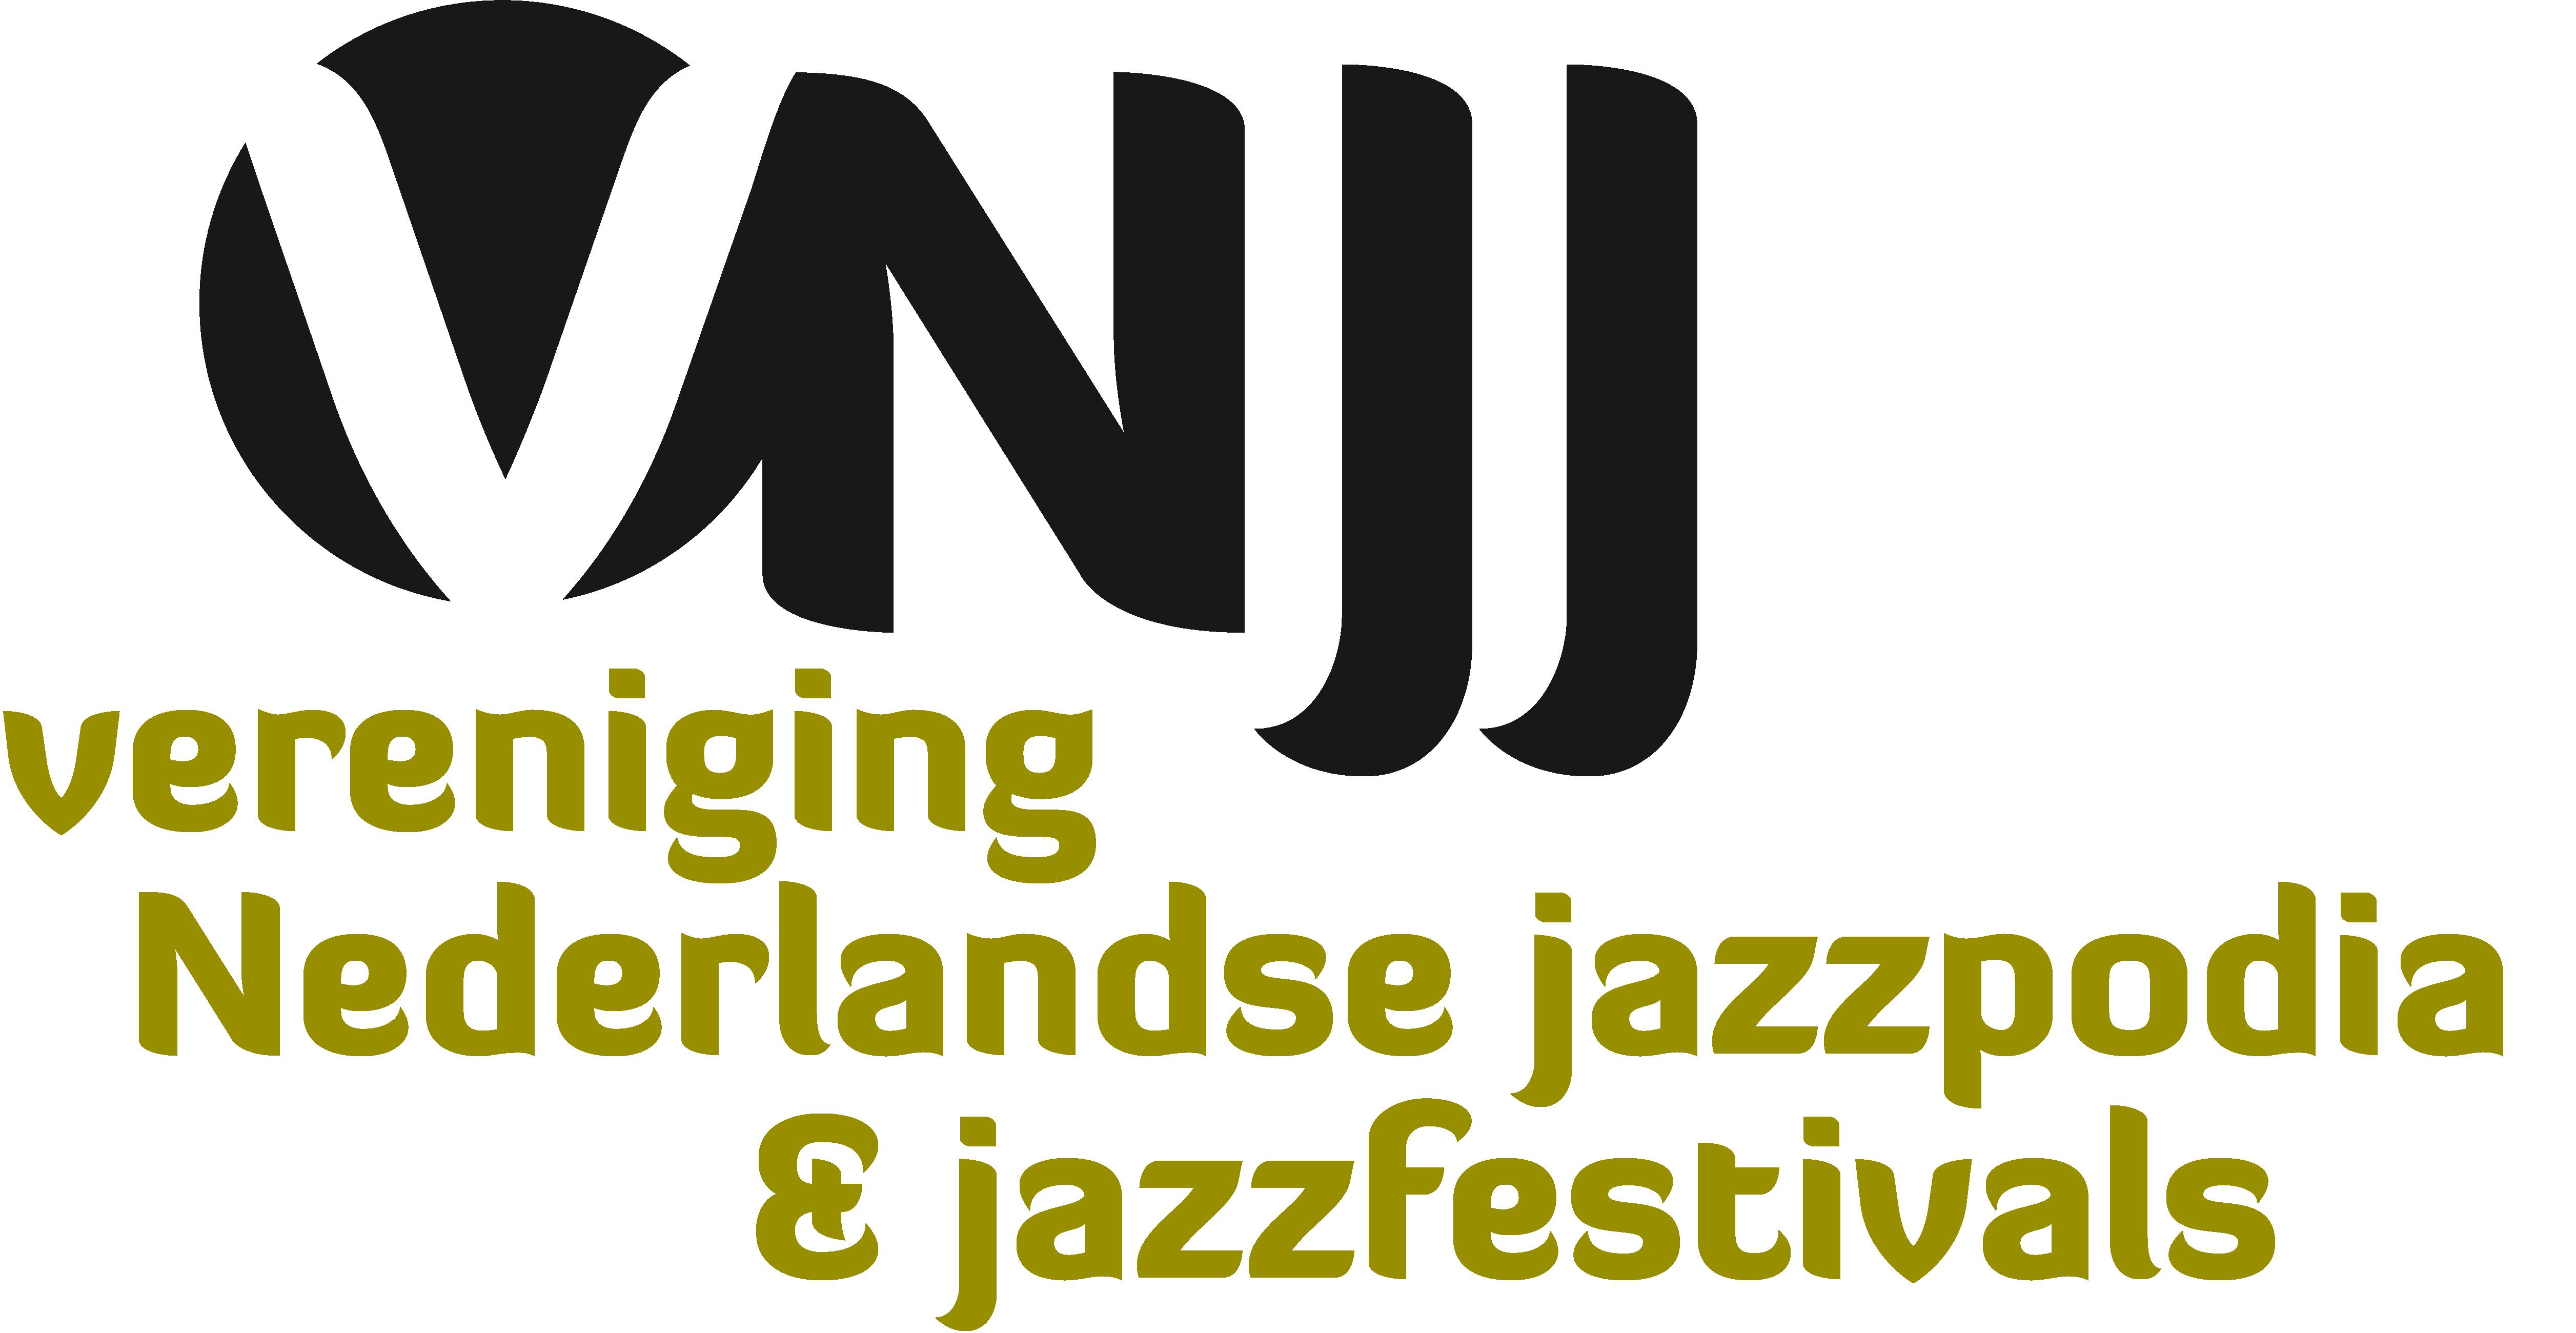 Jazzpodia en -festivals bundelen de kracht in VNJJ